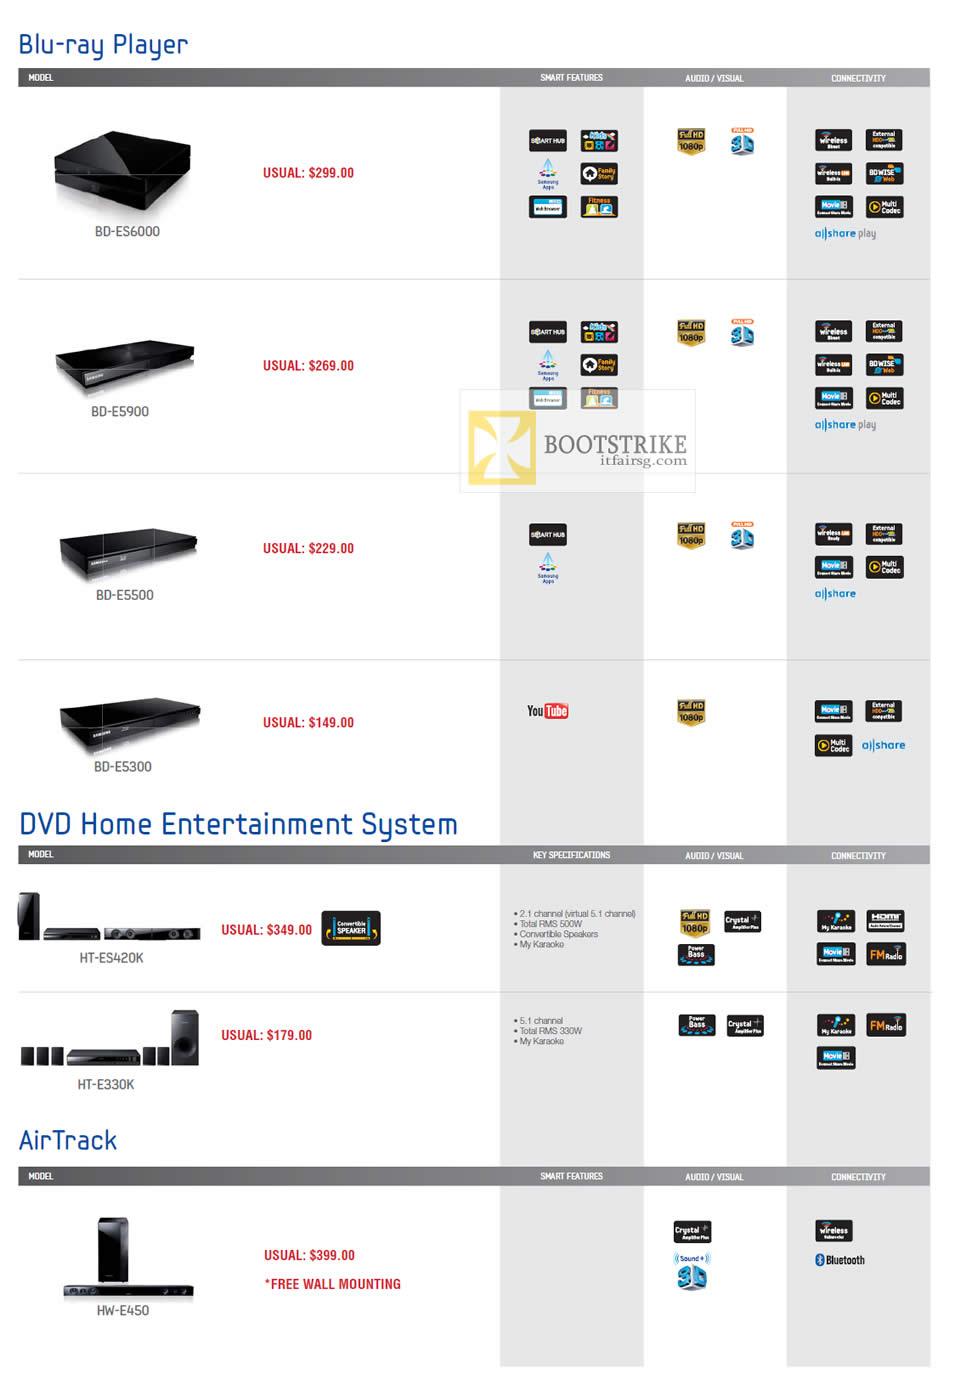 COMEX 2012 price list image brochure of Audio House Samsung Blu-Ray Player BD-ES6000, Bd-ES900, Bd-ES500, BD-ES300, Home Entertainment System, HT-ES420K, HT-E3330K, AirTrack HW-E450